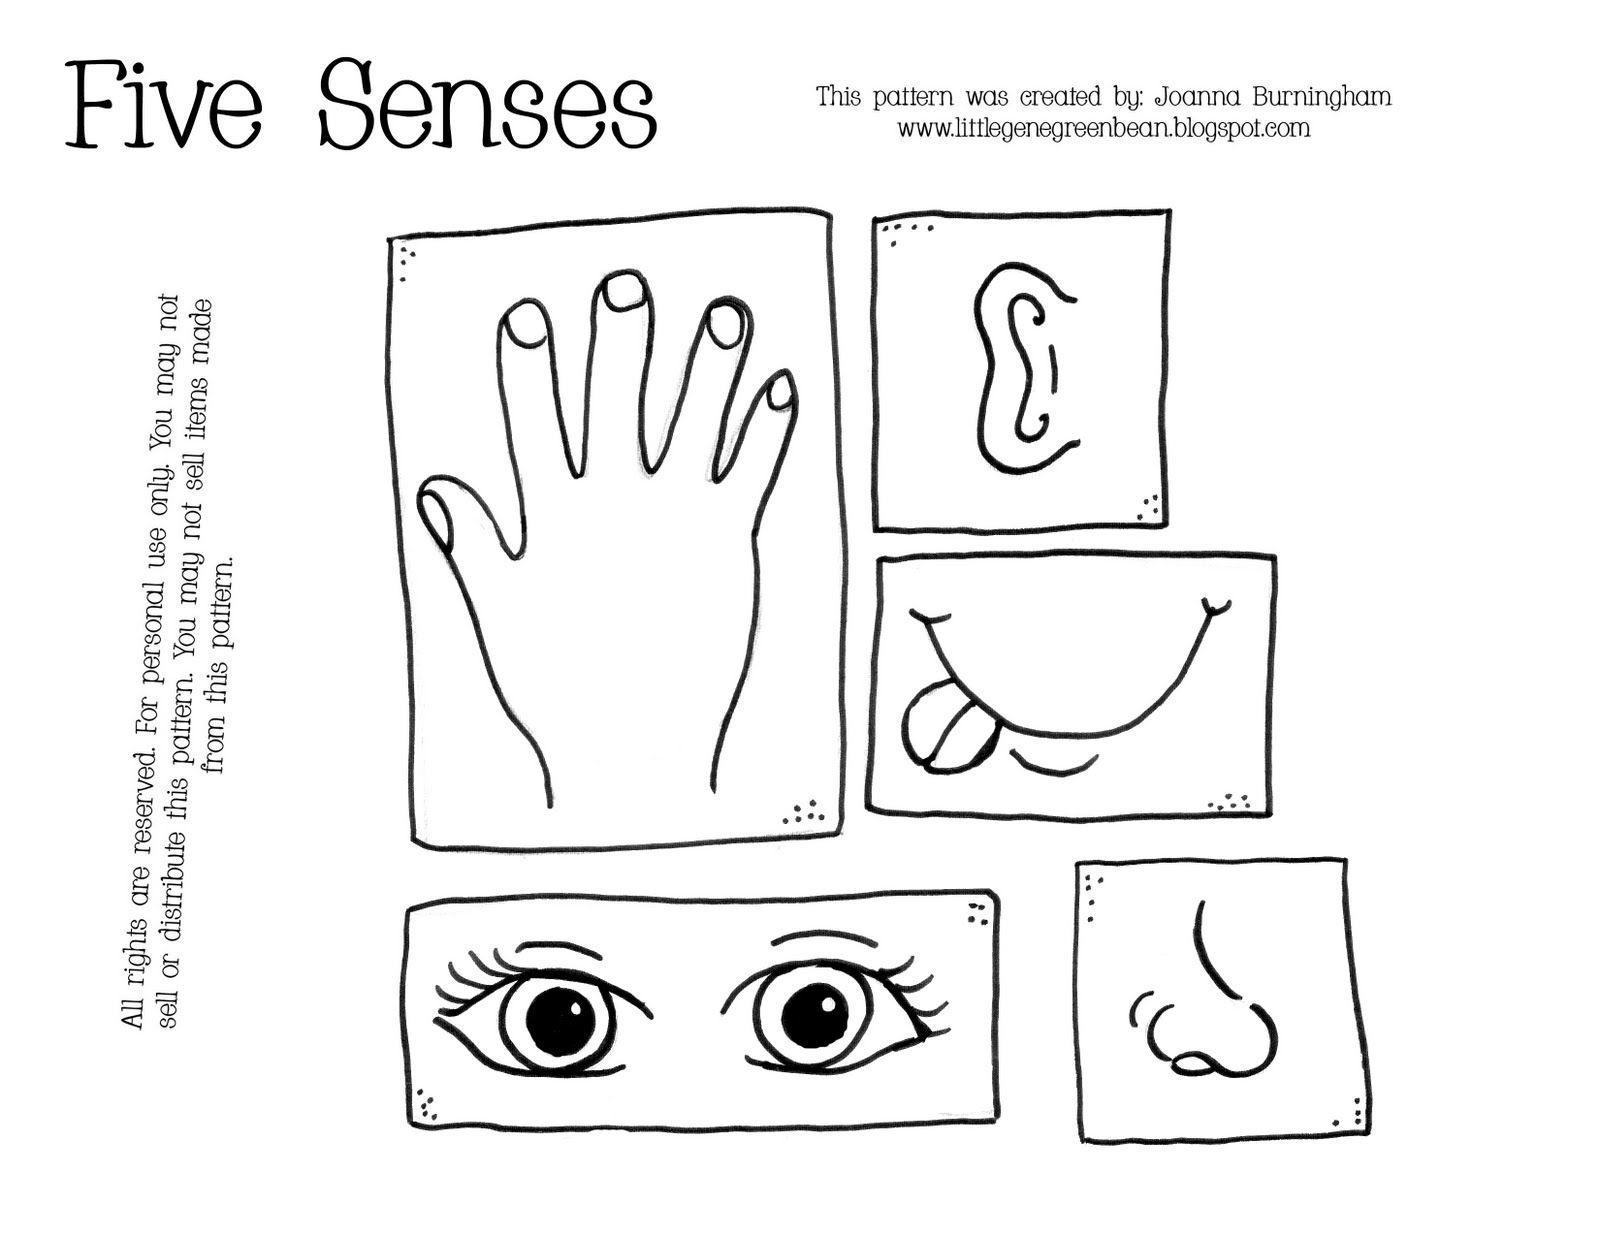 5 senses coloring page - five senses coloring pages preschool